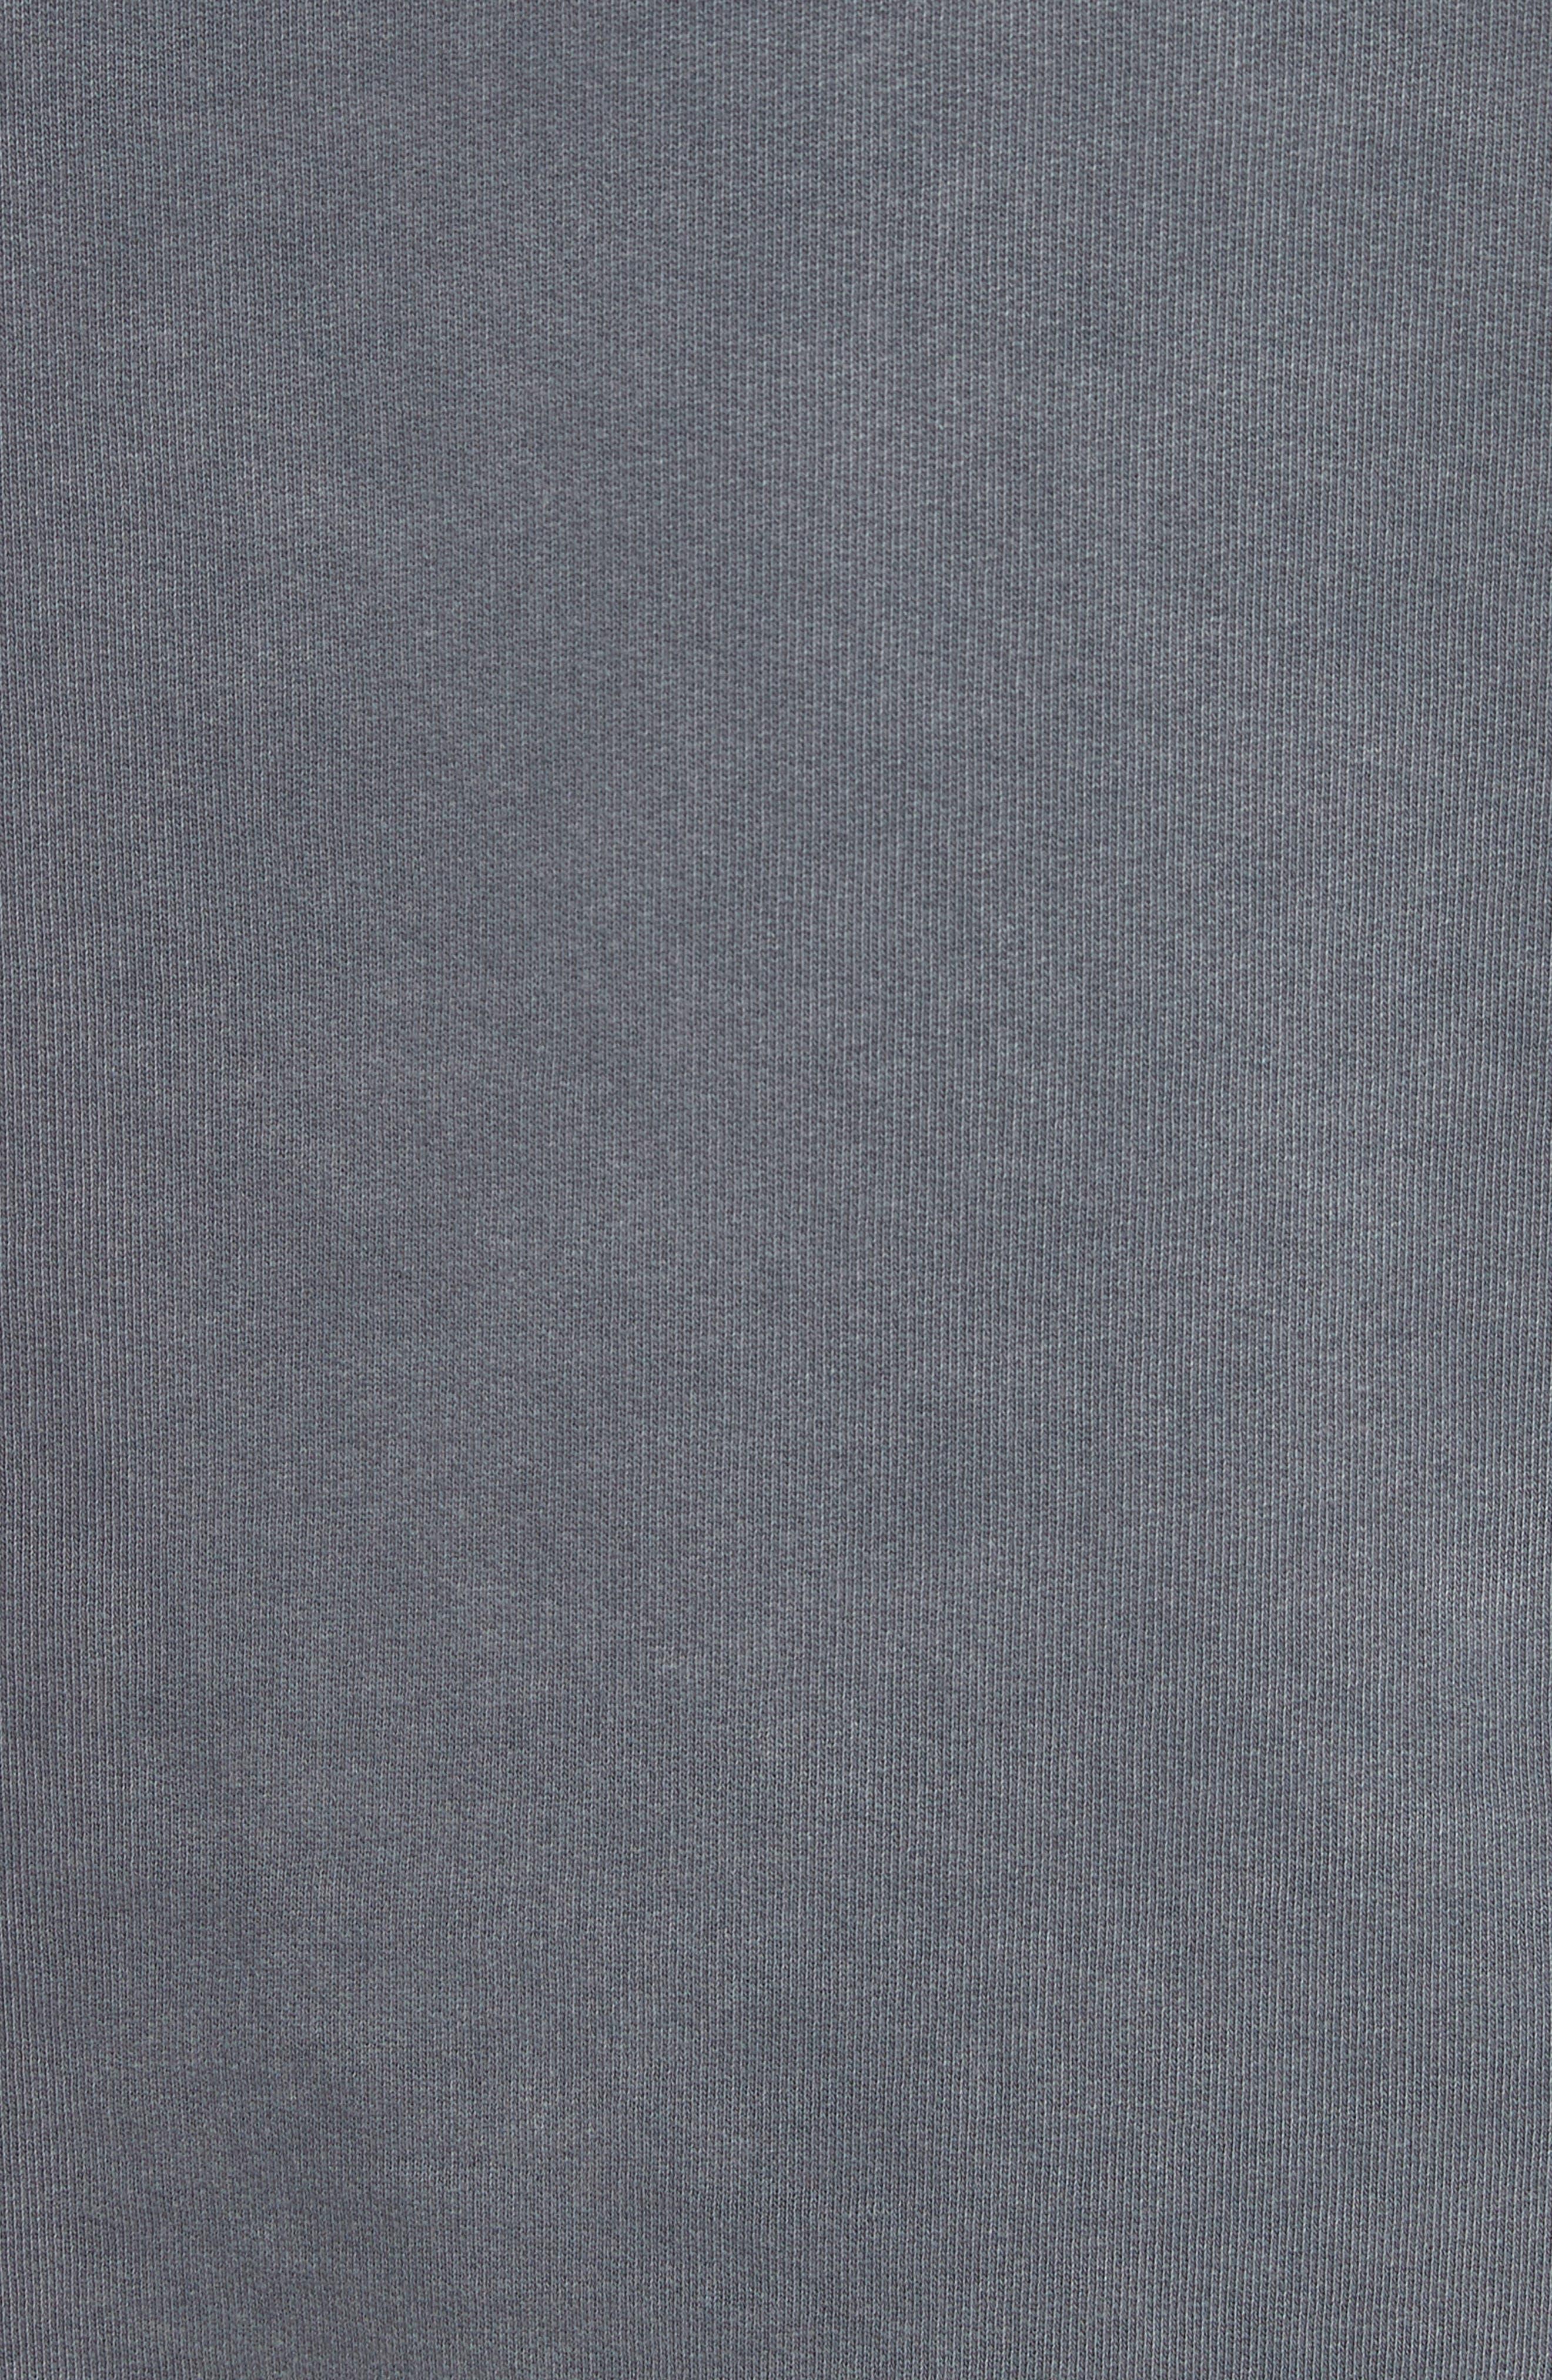 Fala Oversize Washed Hoodie,                             Alternate thumbnail 5, color,                             001